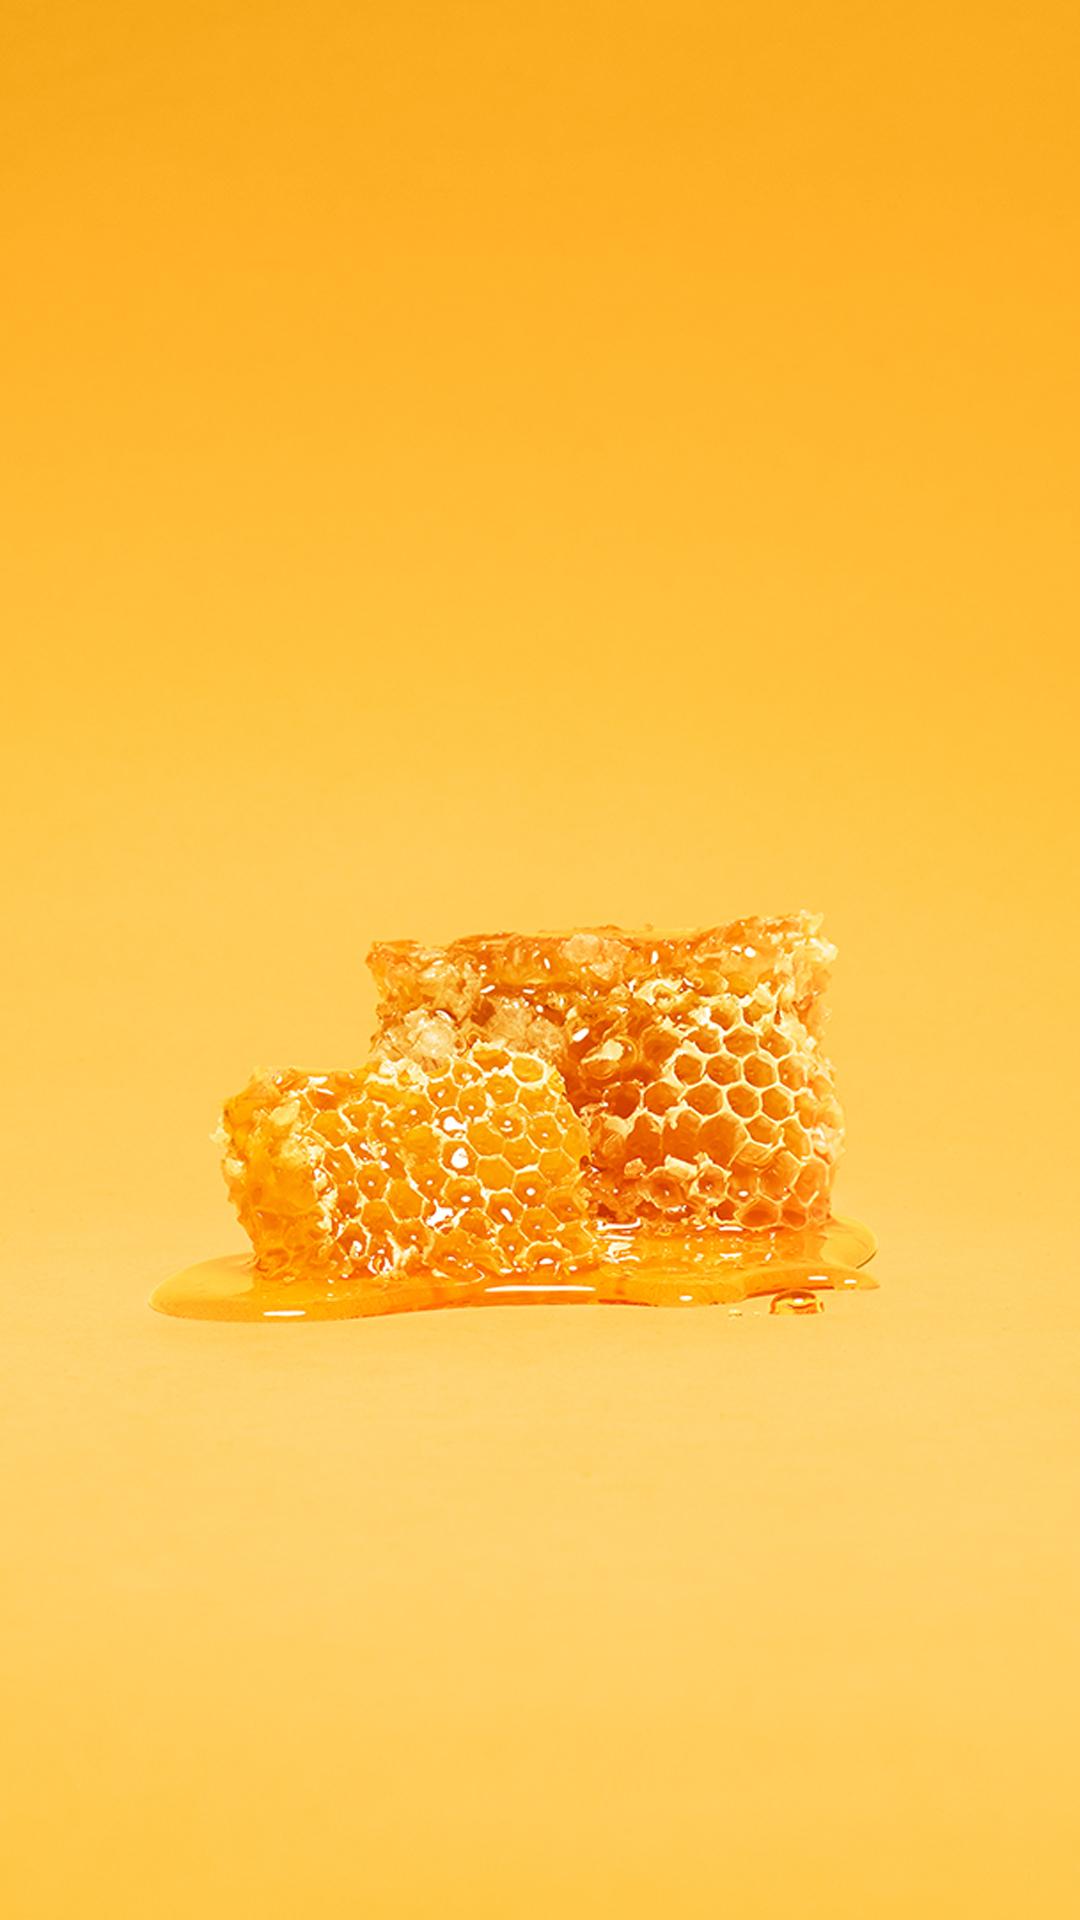 Honey htc one wallpaper